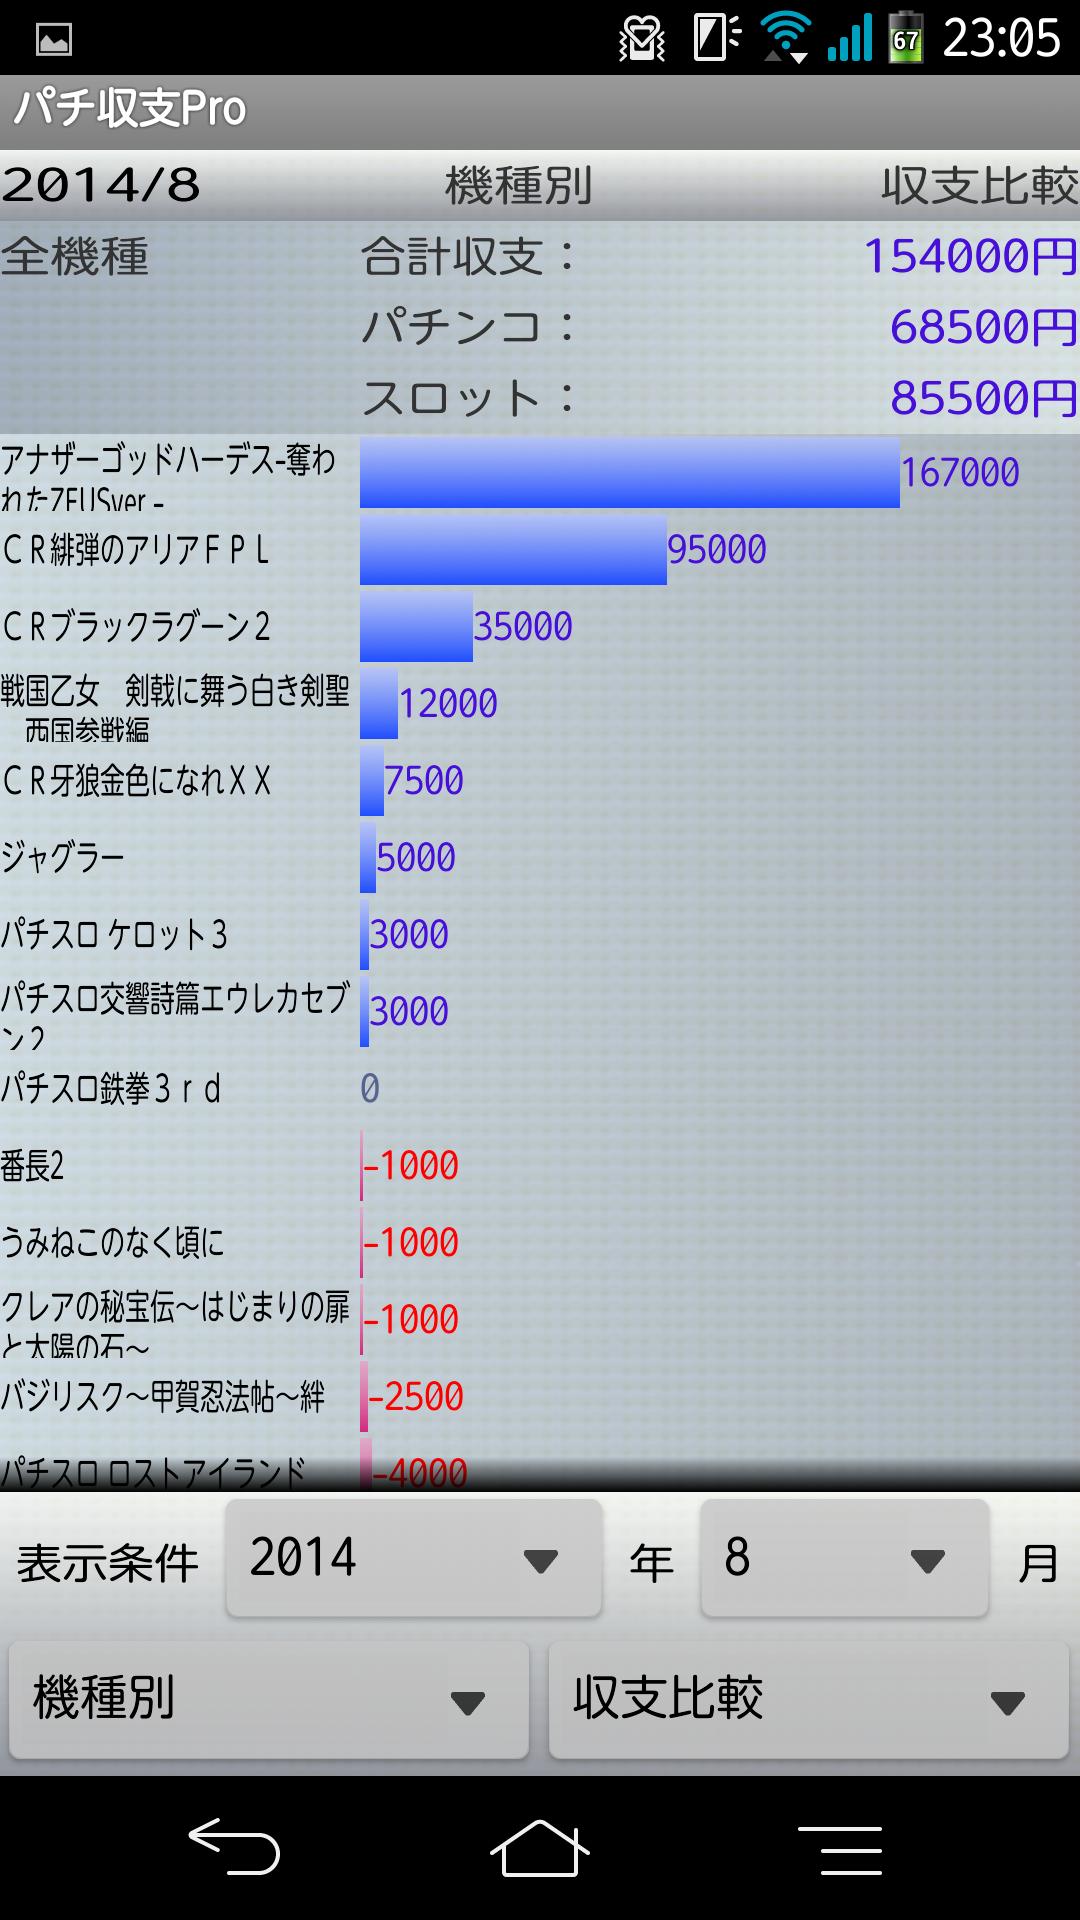 Screenshot_2014-08-31-23-05-27.png